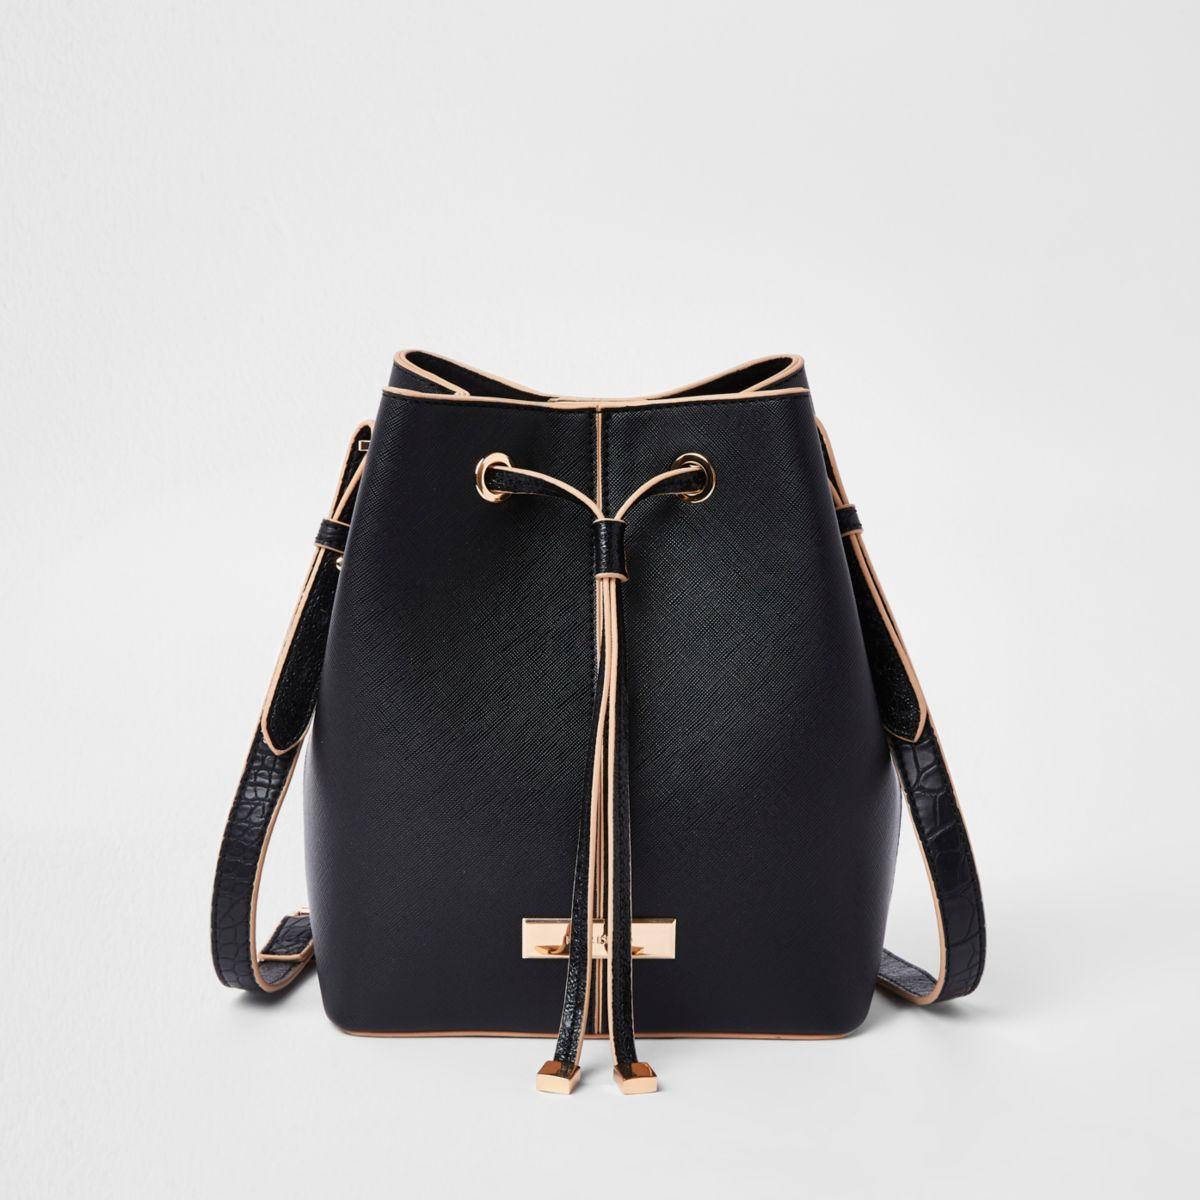 Black faux leather drawstring duffle bag